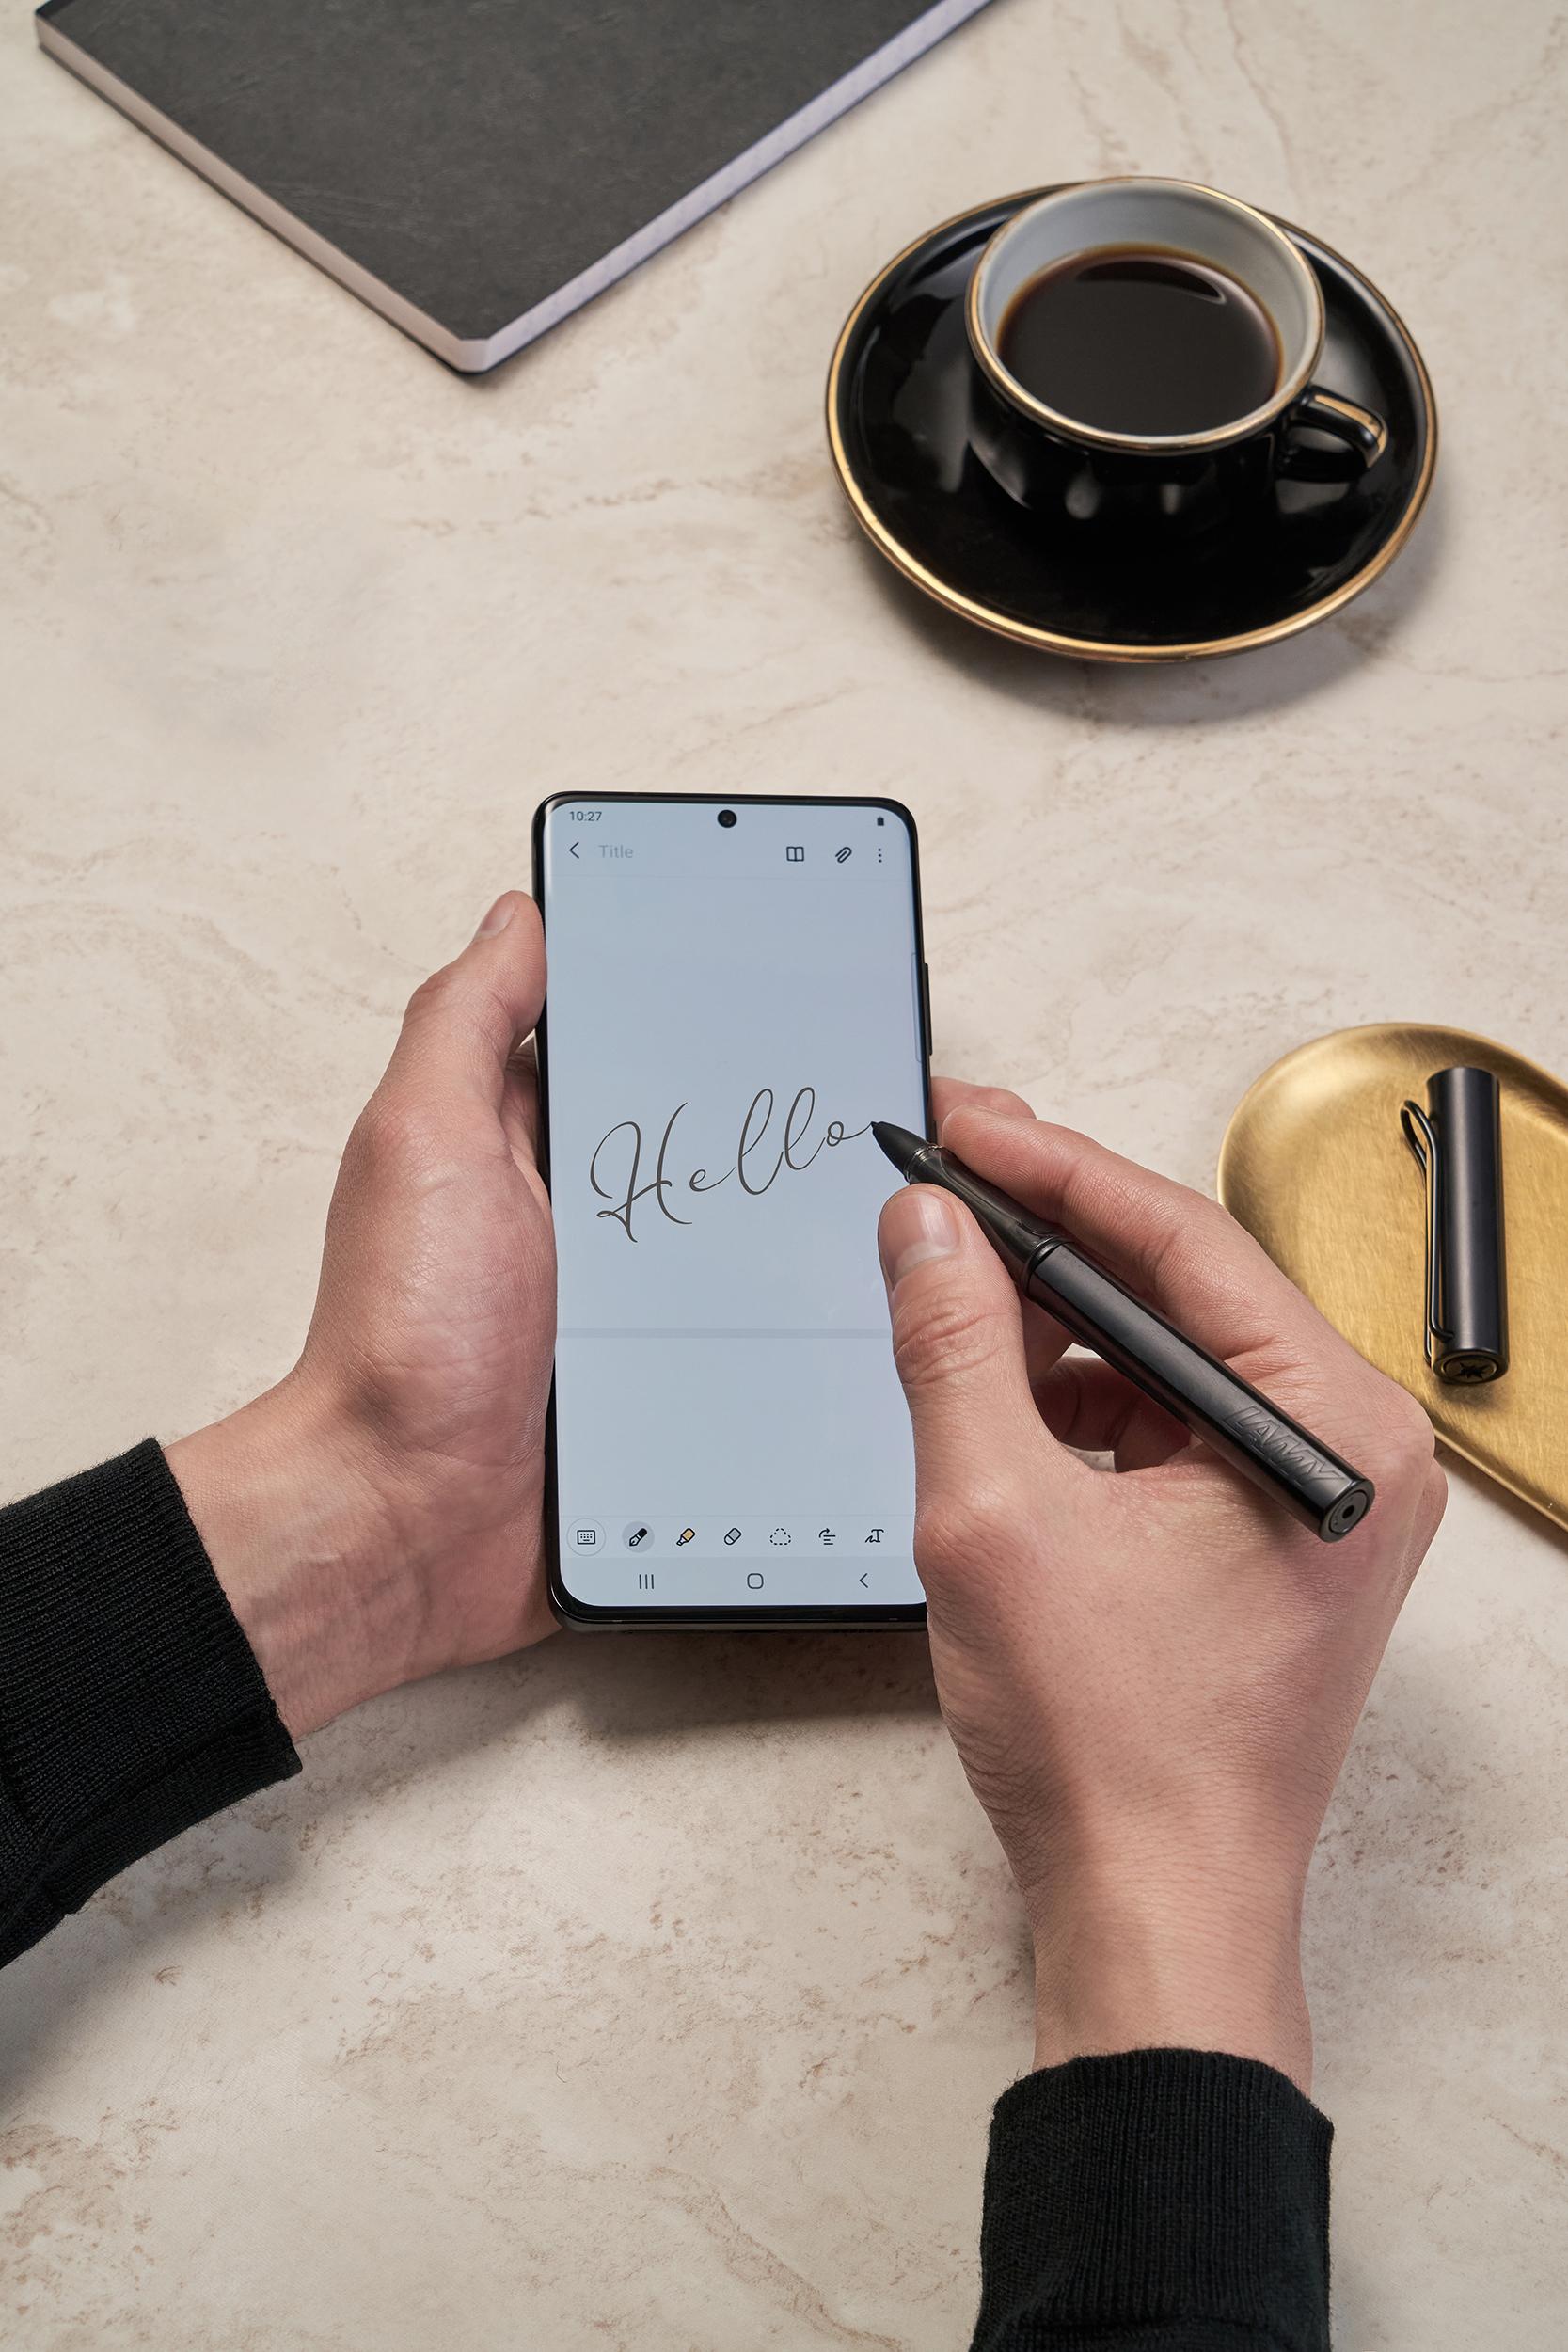 Samsung Galaxy S21 Ultra Lifestyle Cut Customize